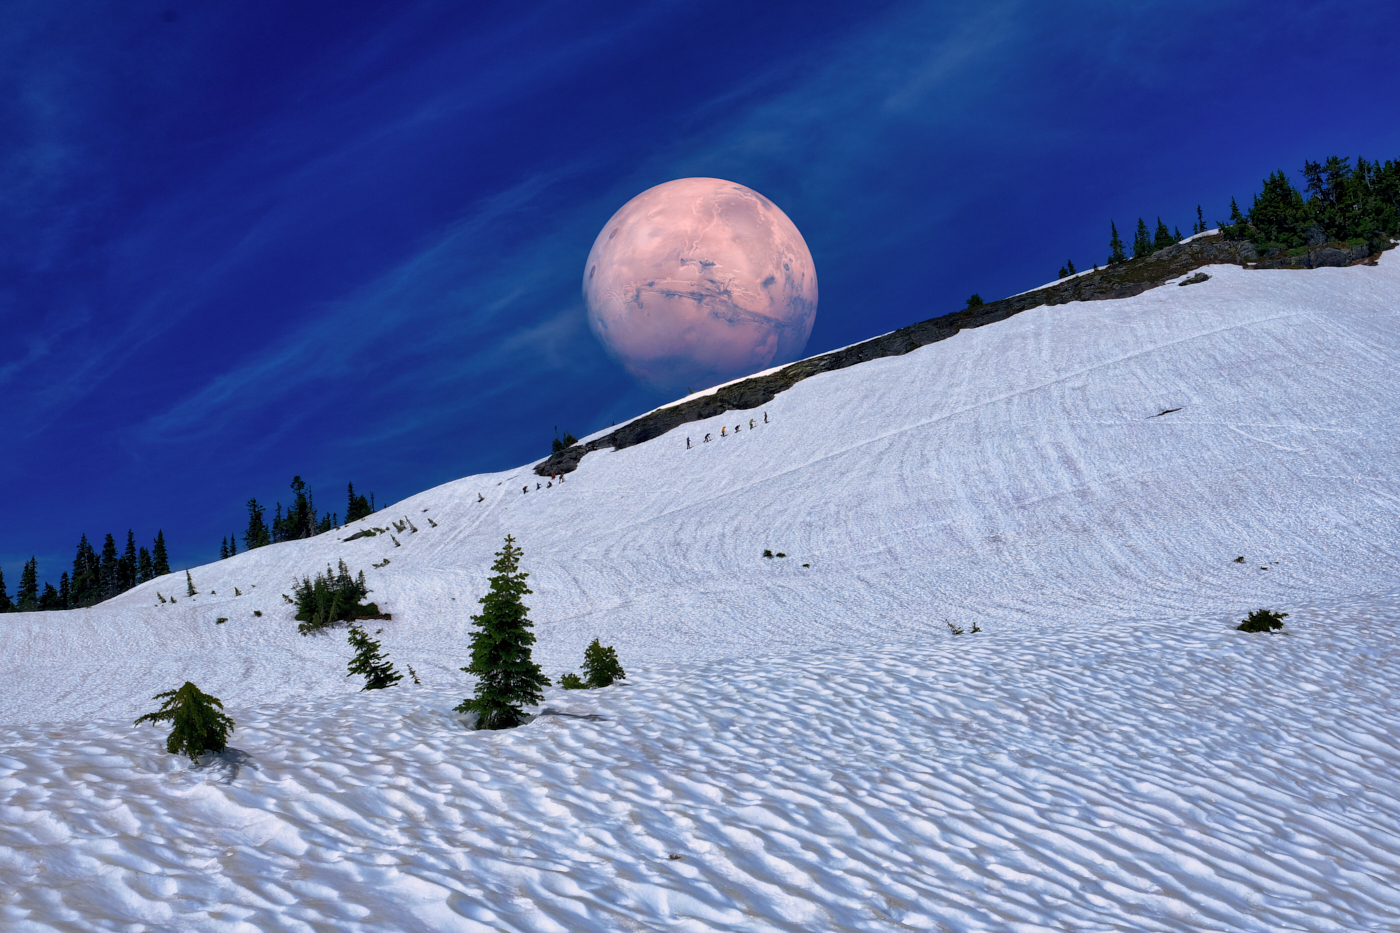 Bad Moon Rising - Richard Krieger